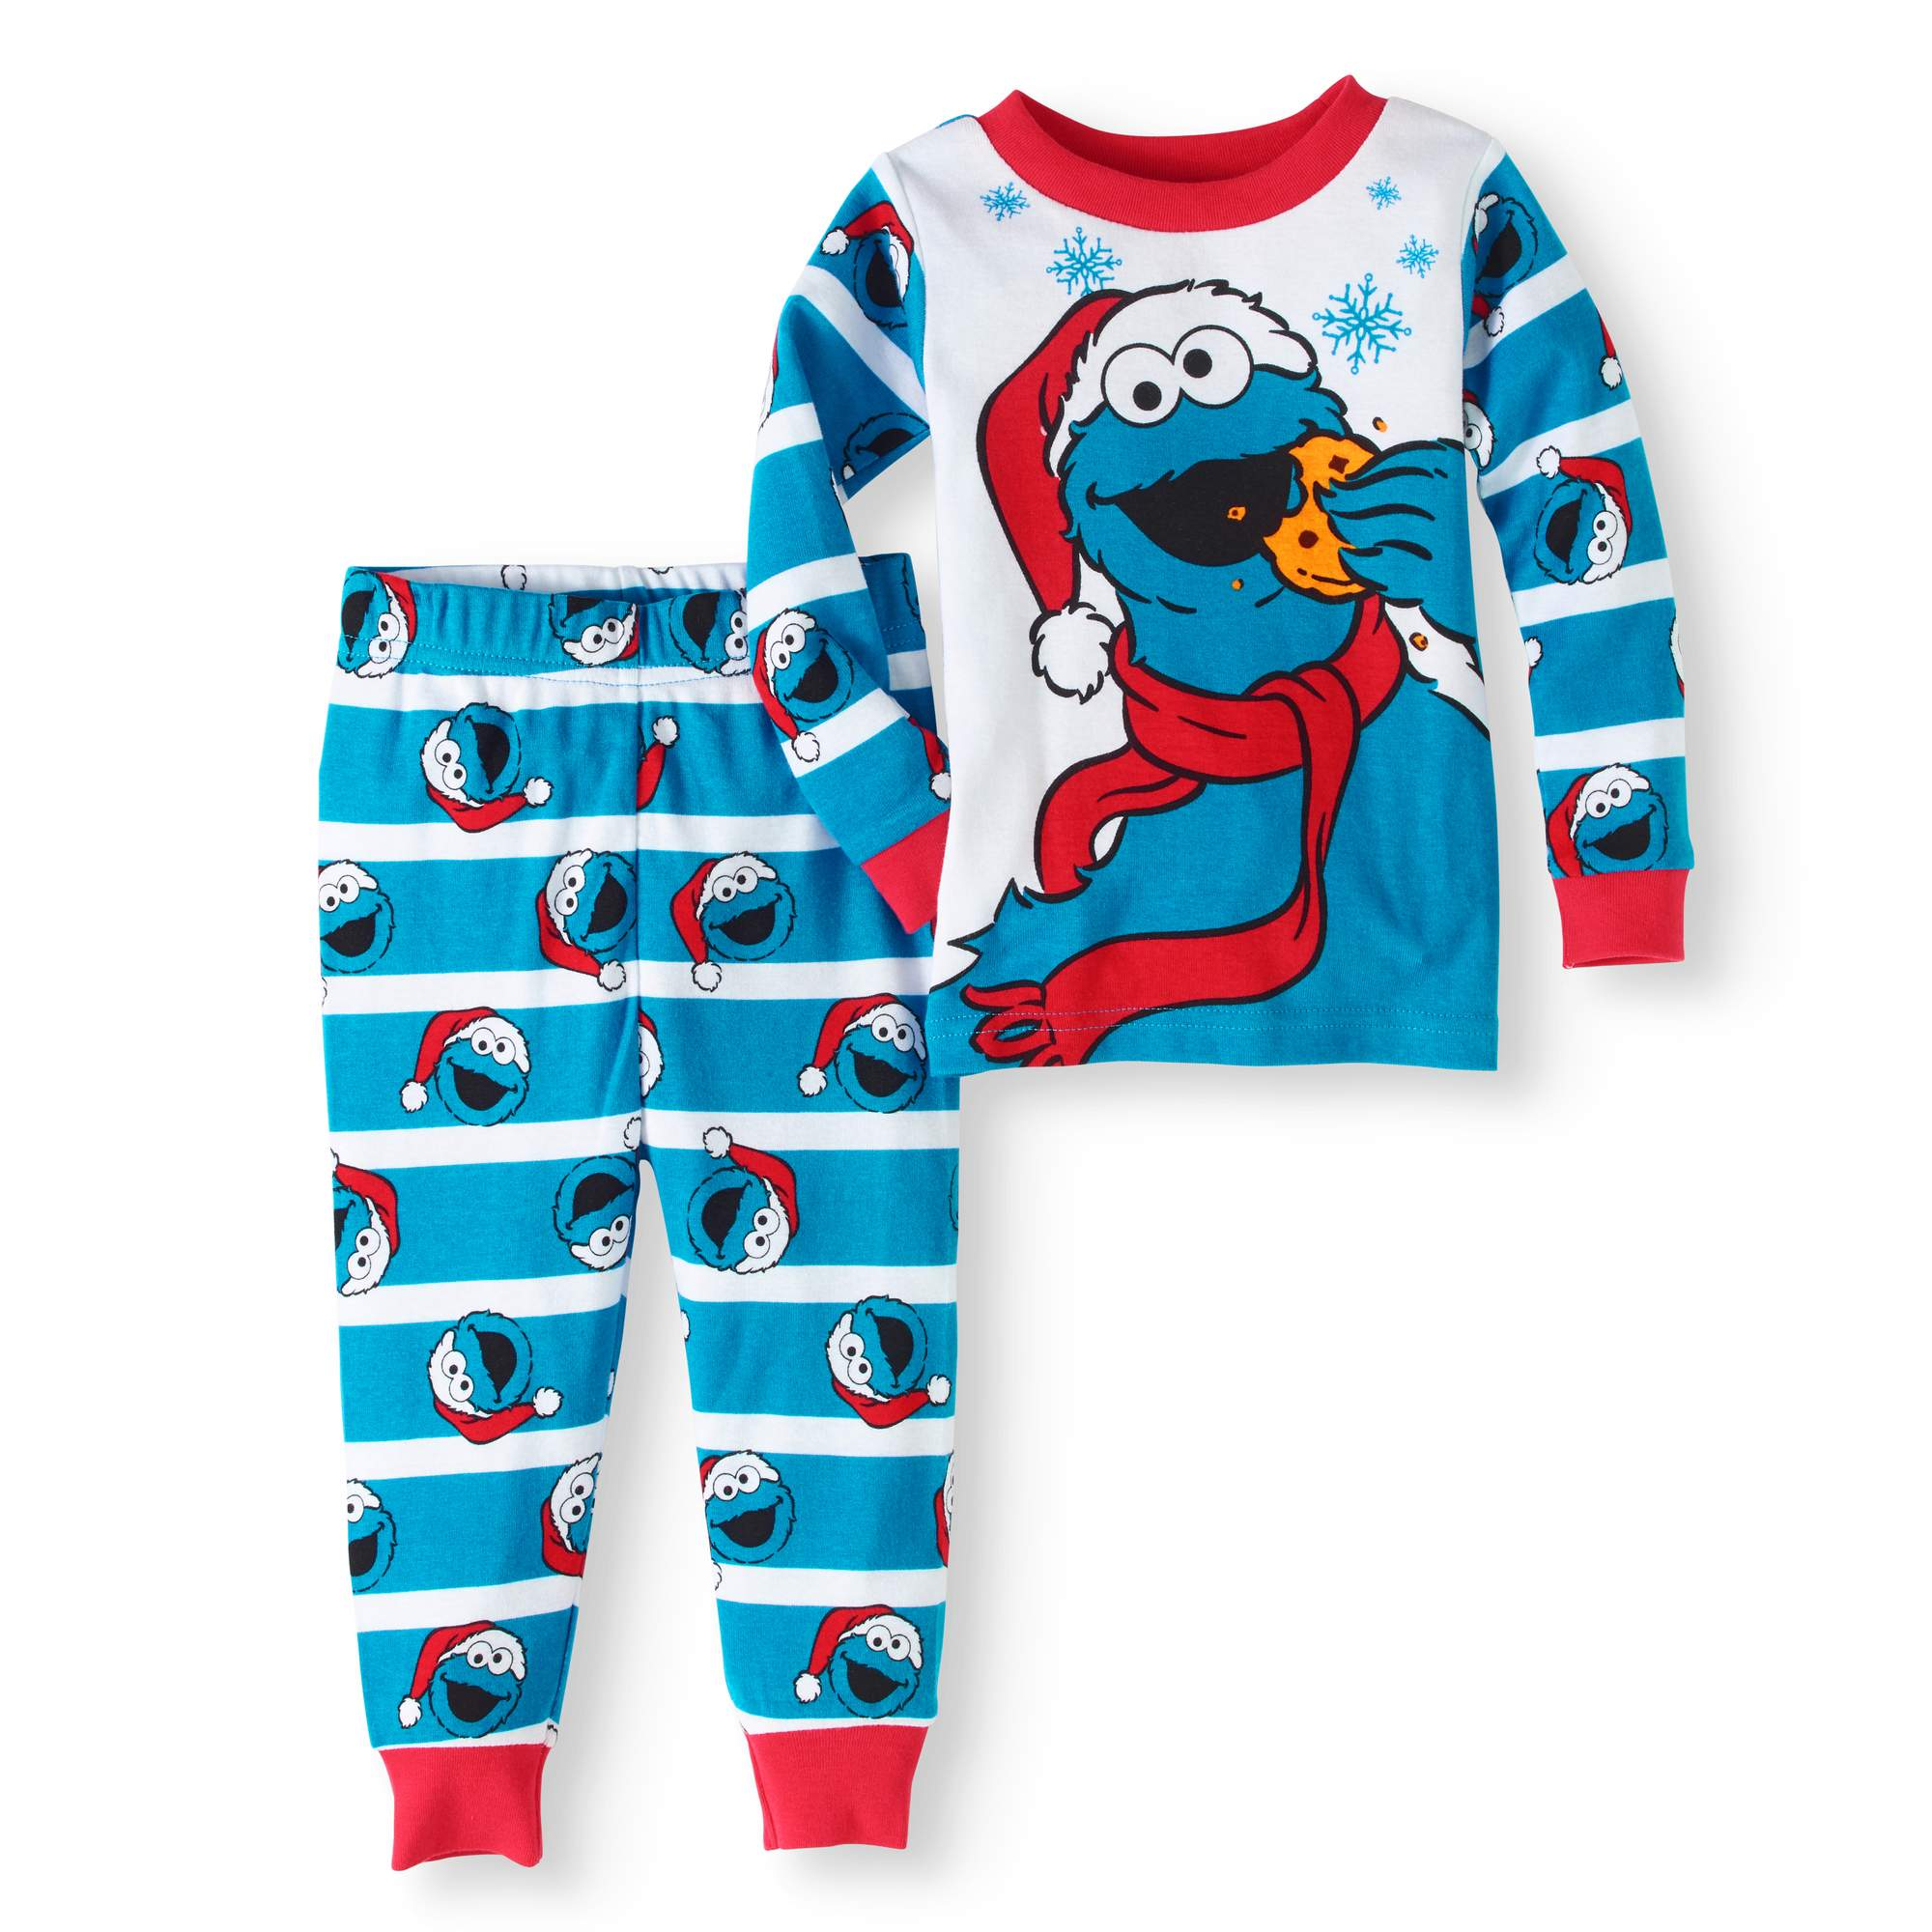 c77742e5815a Christmas Newborn Baby Boys  Cotton Tight Fit Pajamas 2-Piece Set ...